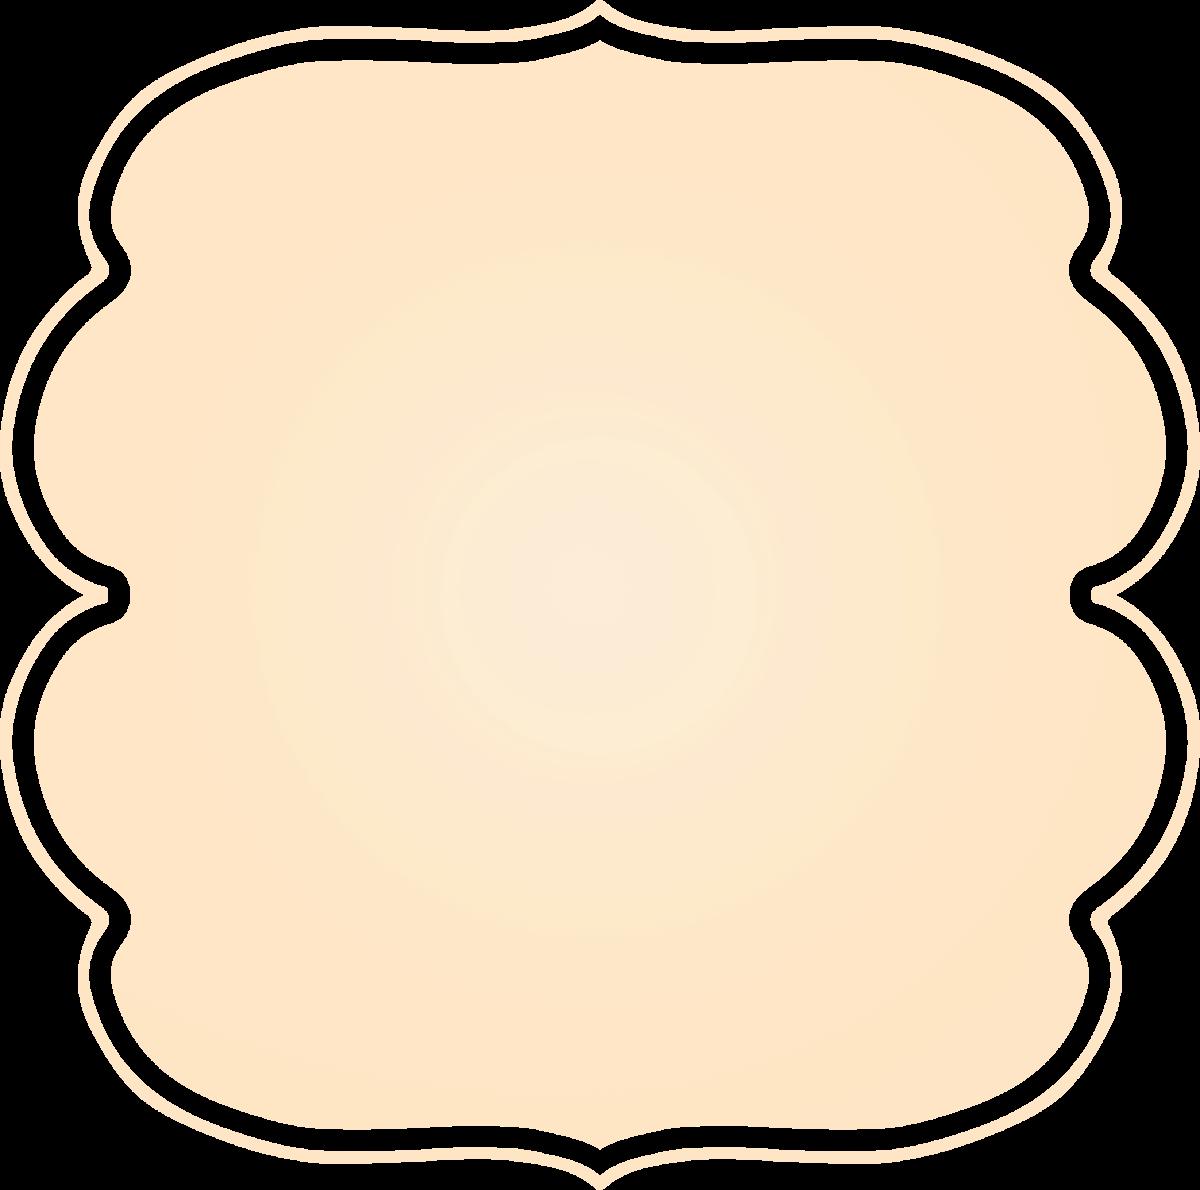 ppt 背景 背景图片 边框 模板 设计 矢量 矢量图 素材 相框 1200_1190